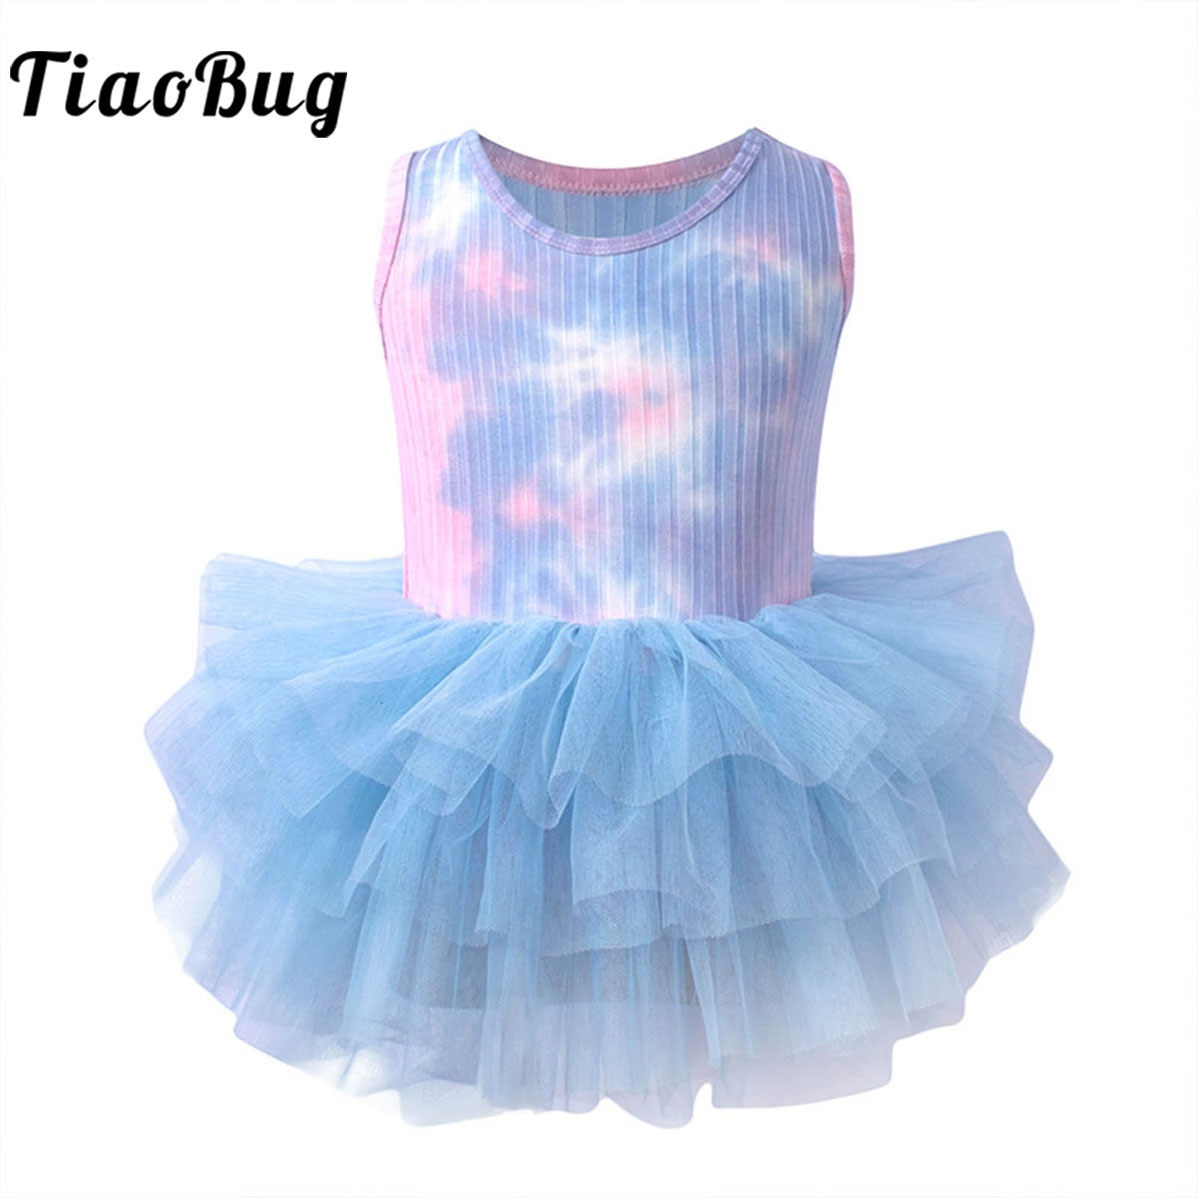 Ballerina Fairy Prom Party Costume Kids Flower Dress Girls Dance Wear Gymnastic Ballet Leotard Tutu